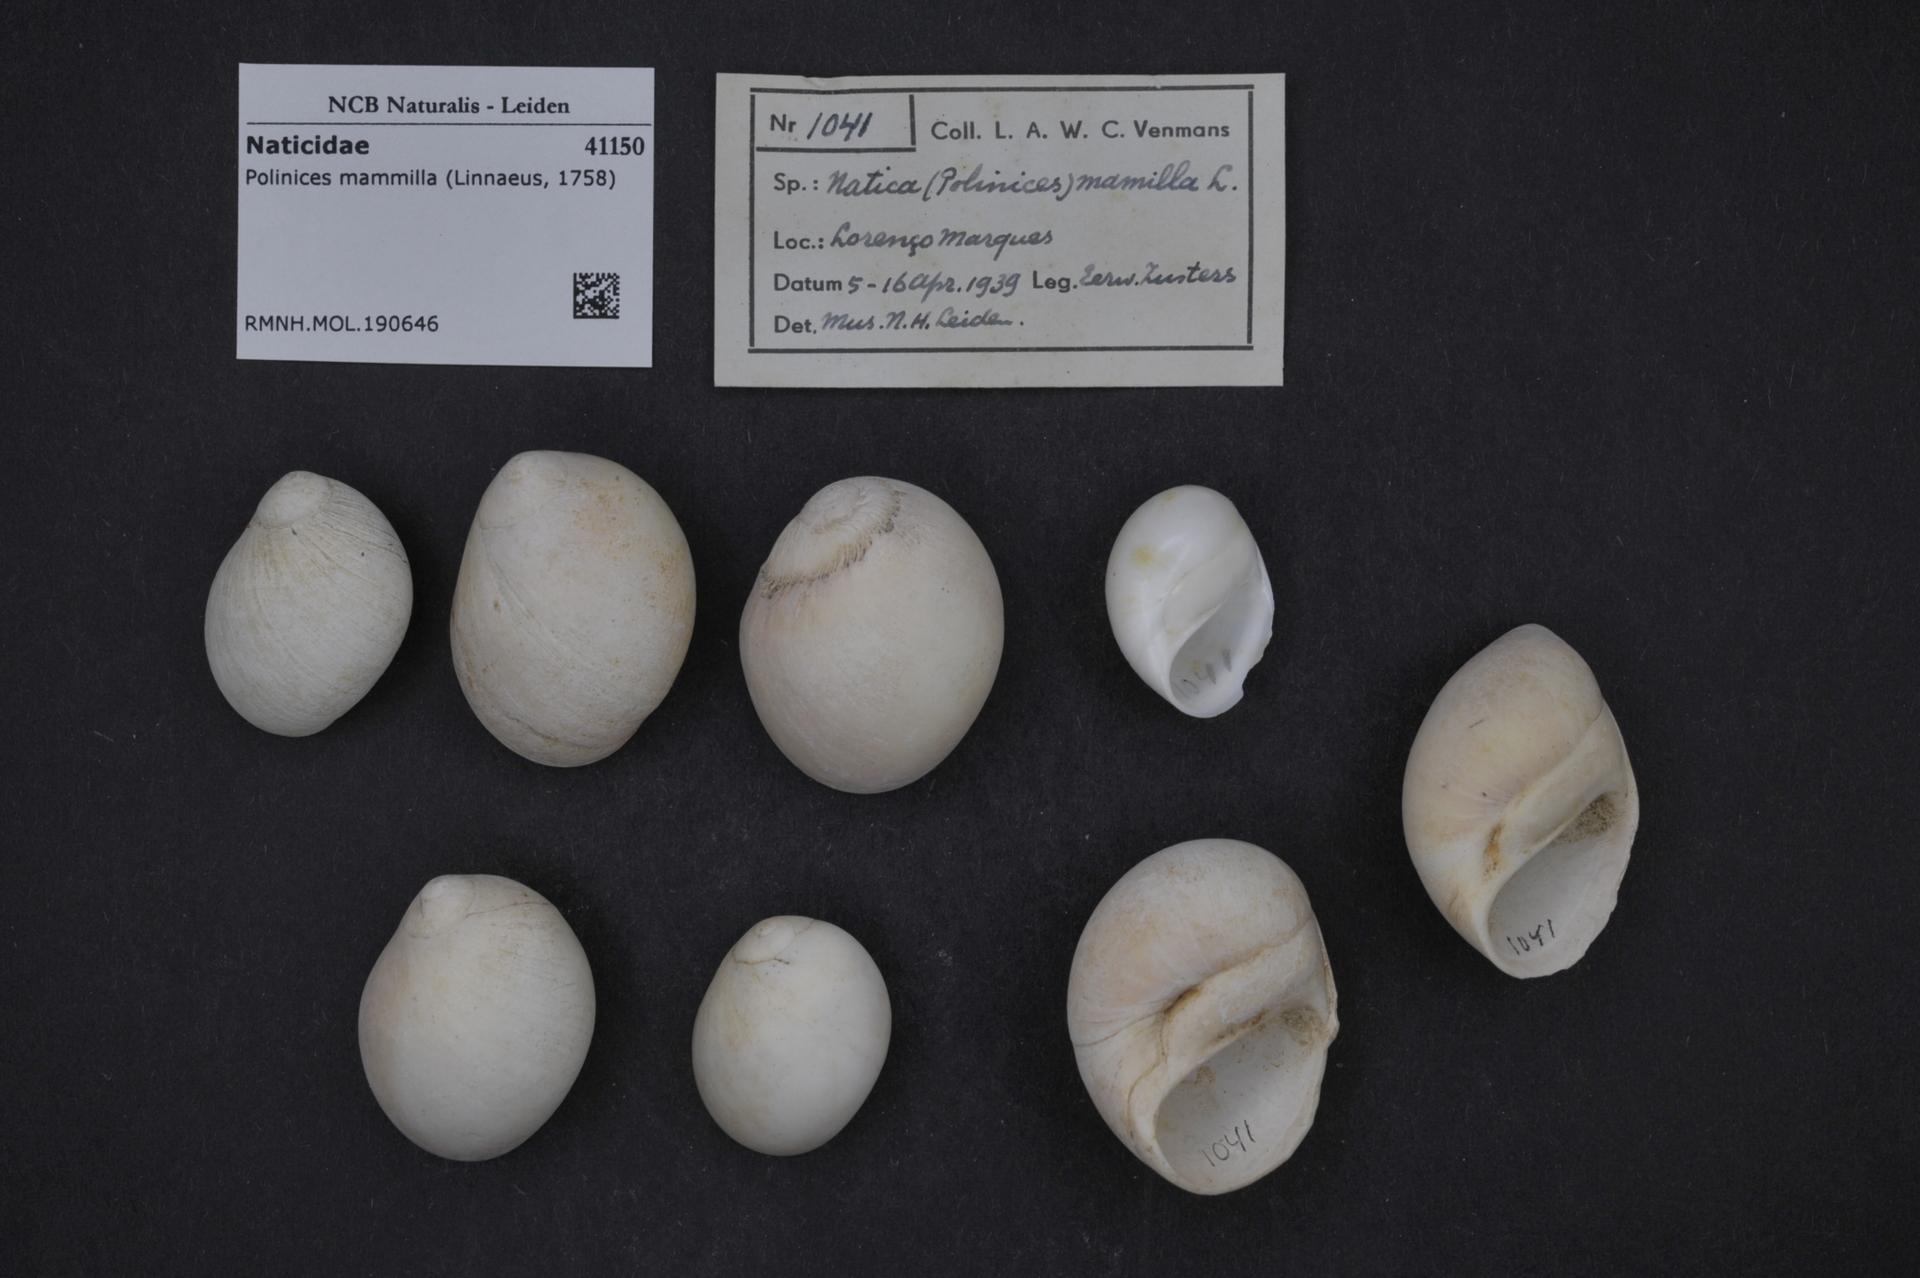 RMNH.MOL.190646 | Polinices mammilla (Linnaeus, 1758)